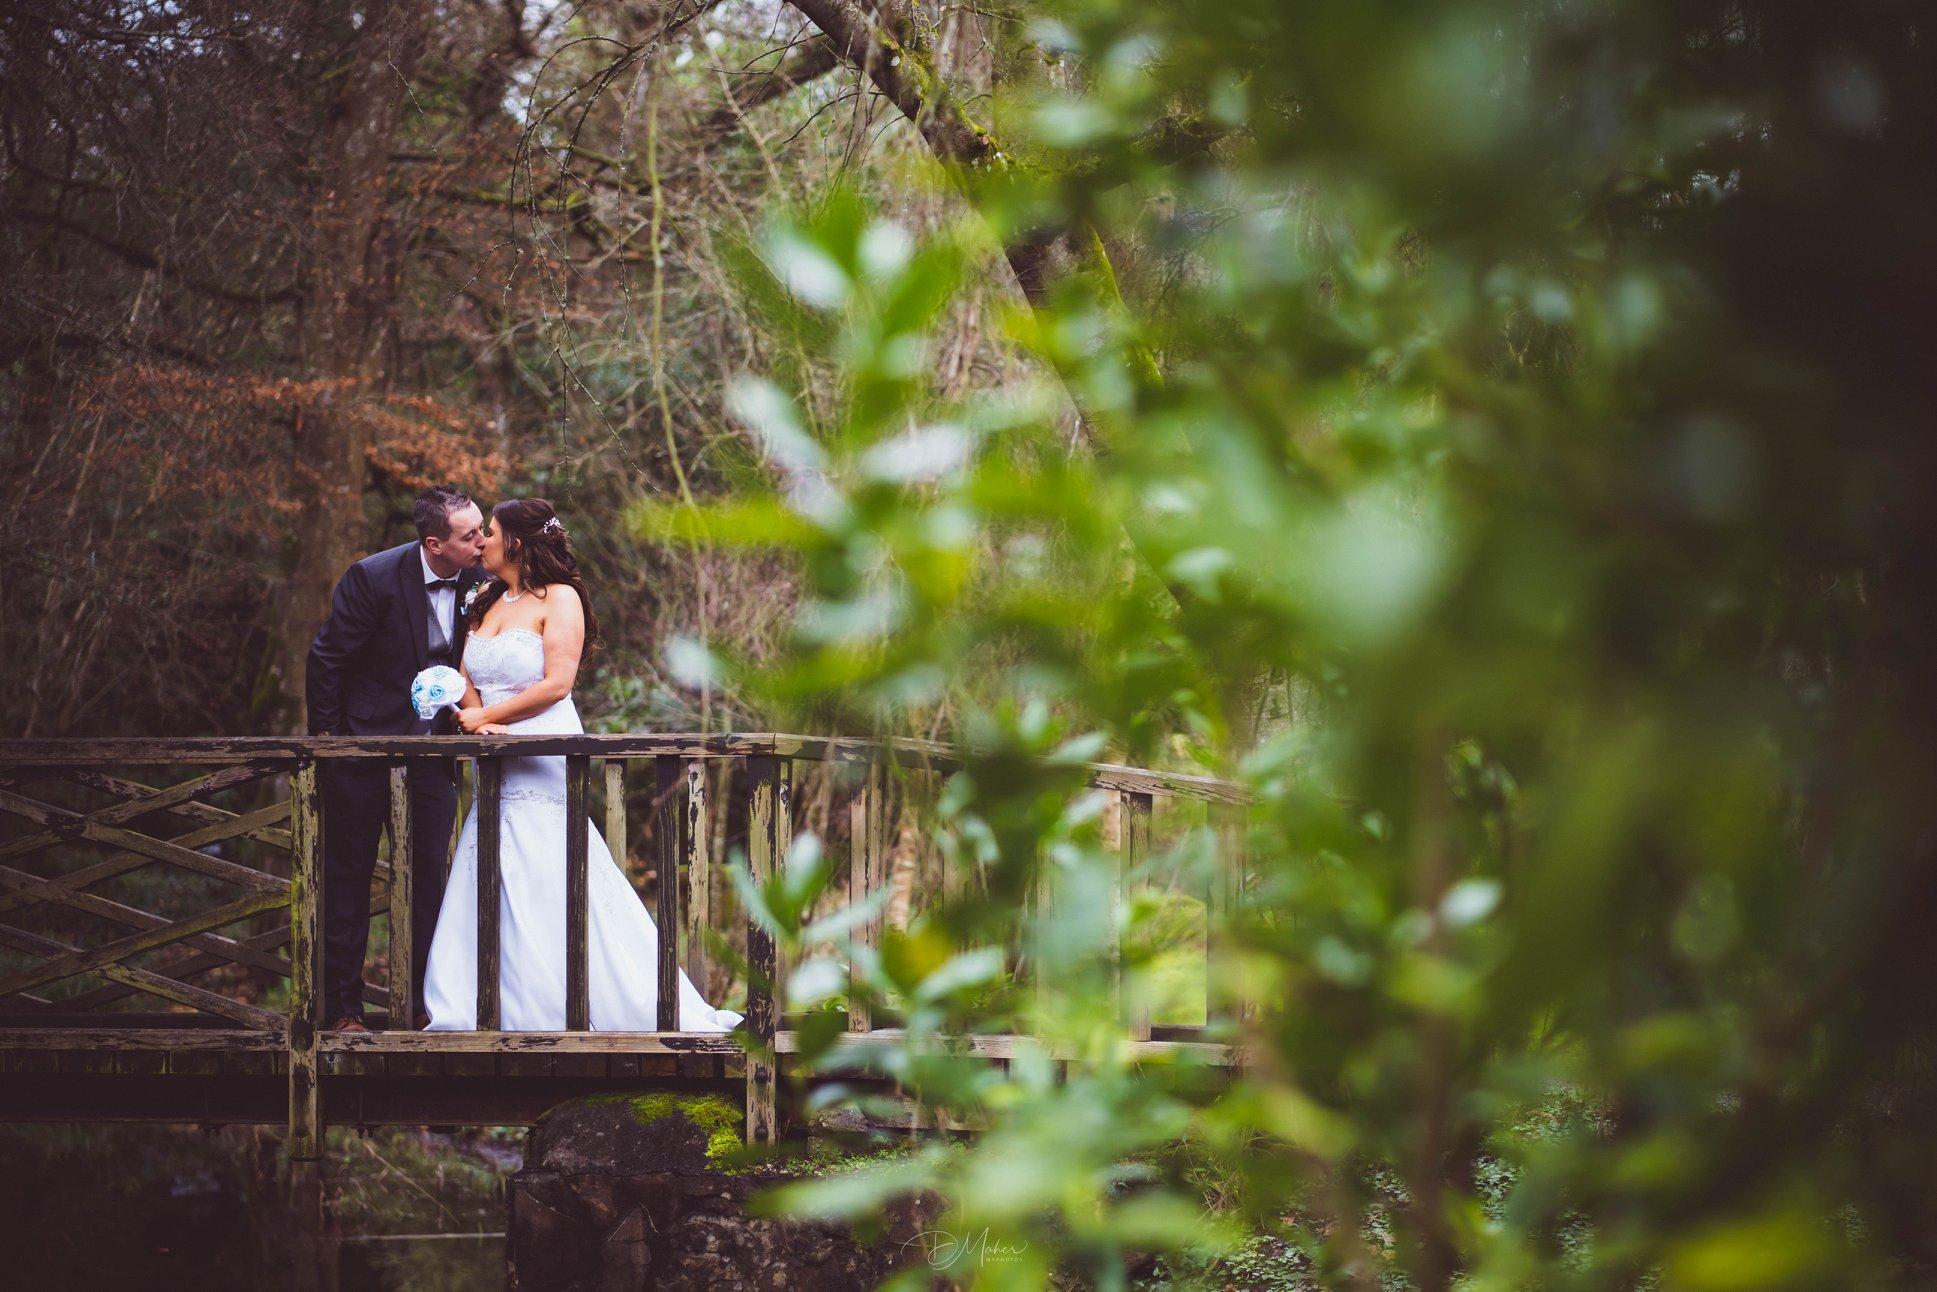 Darren-Maher-wedding-photography-ireland